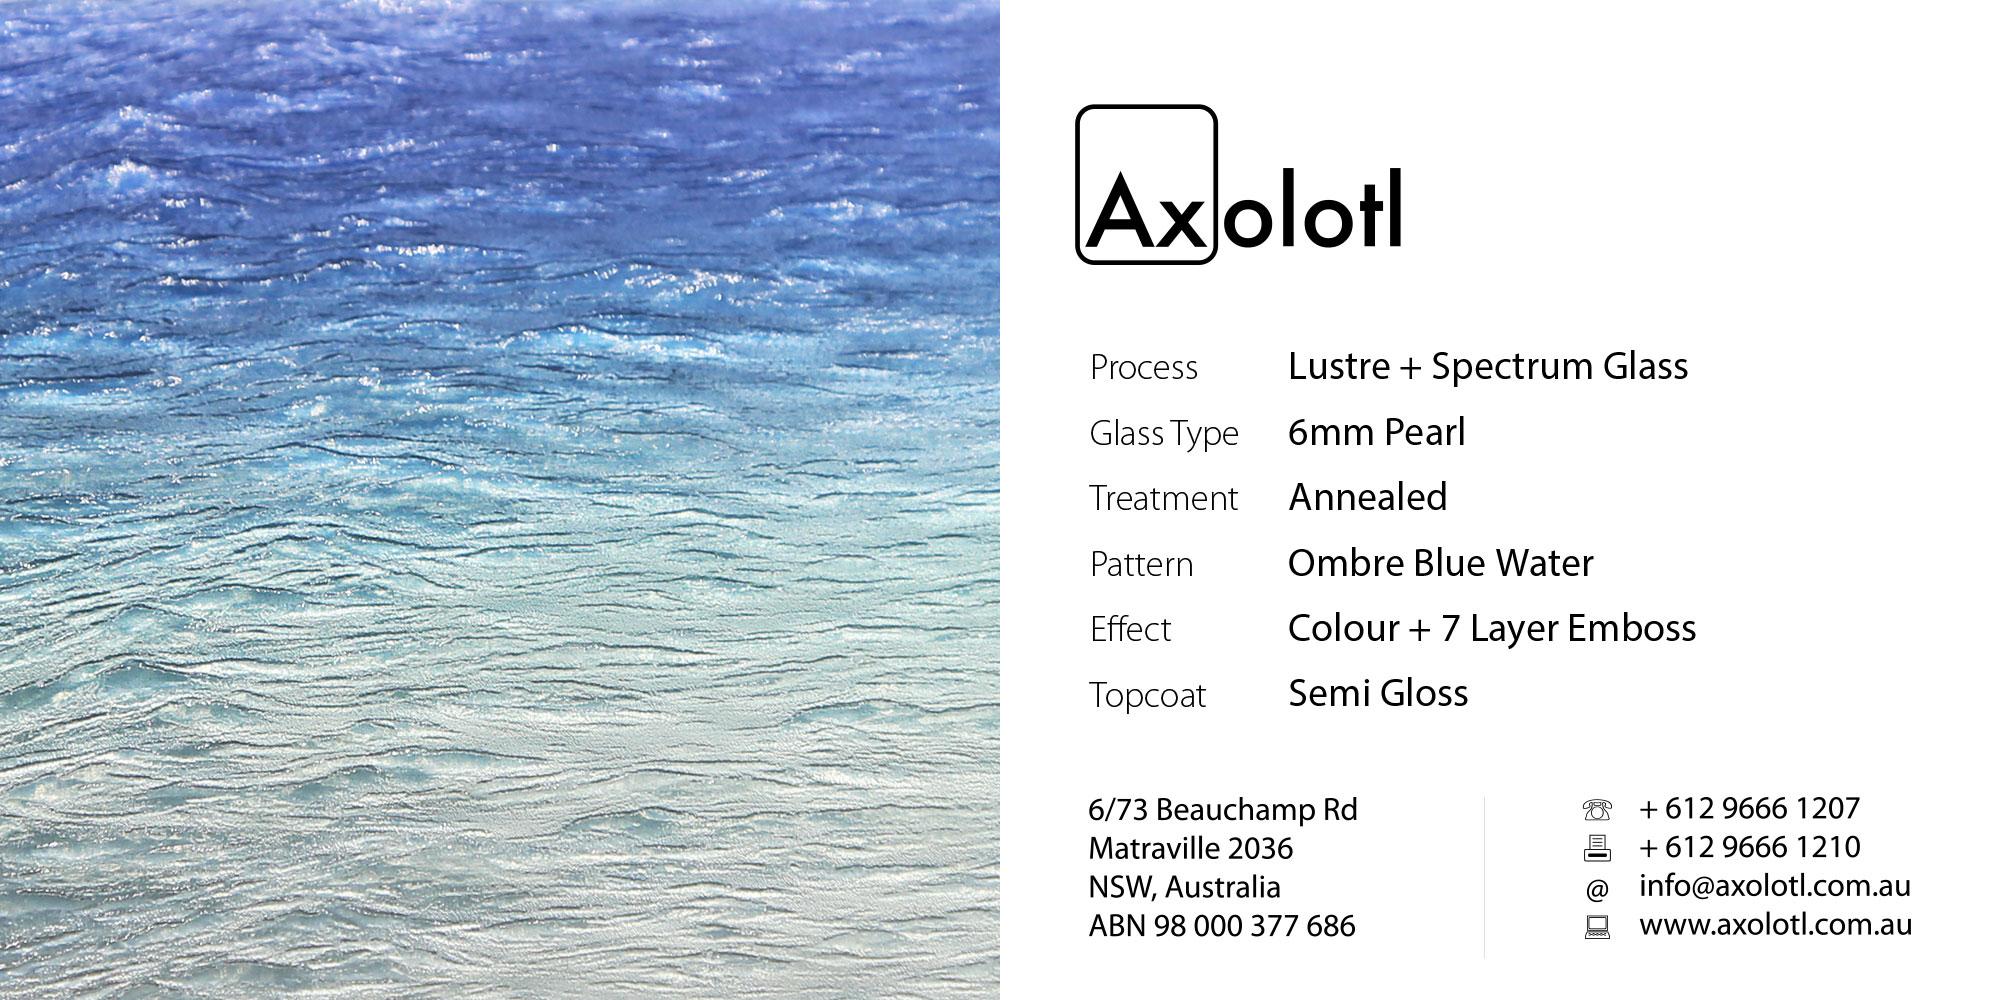 Axolotl_LustreSpectrum_BlueOmbre_Water.jpg